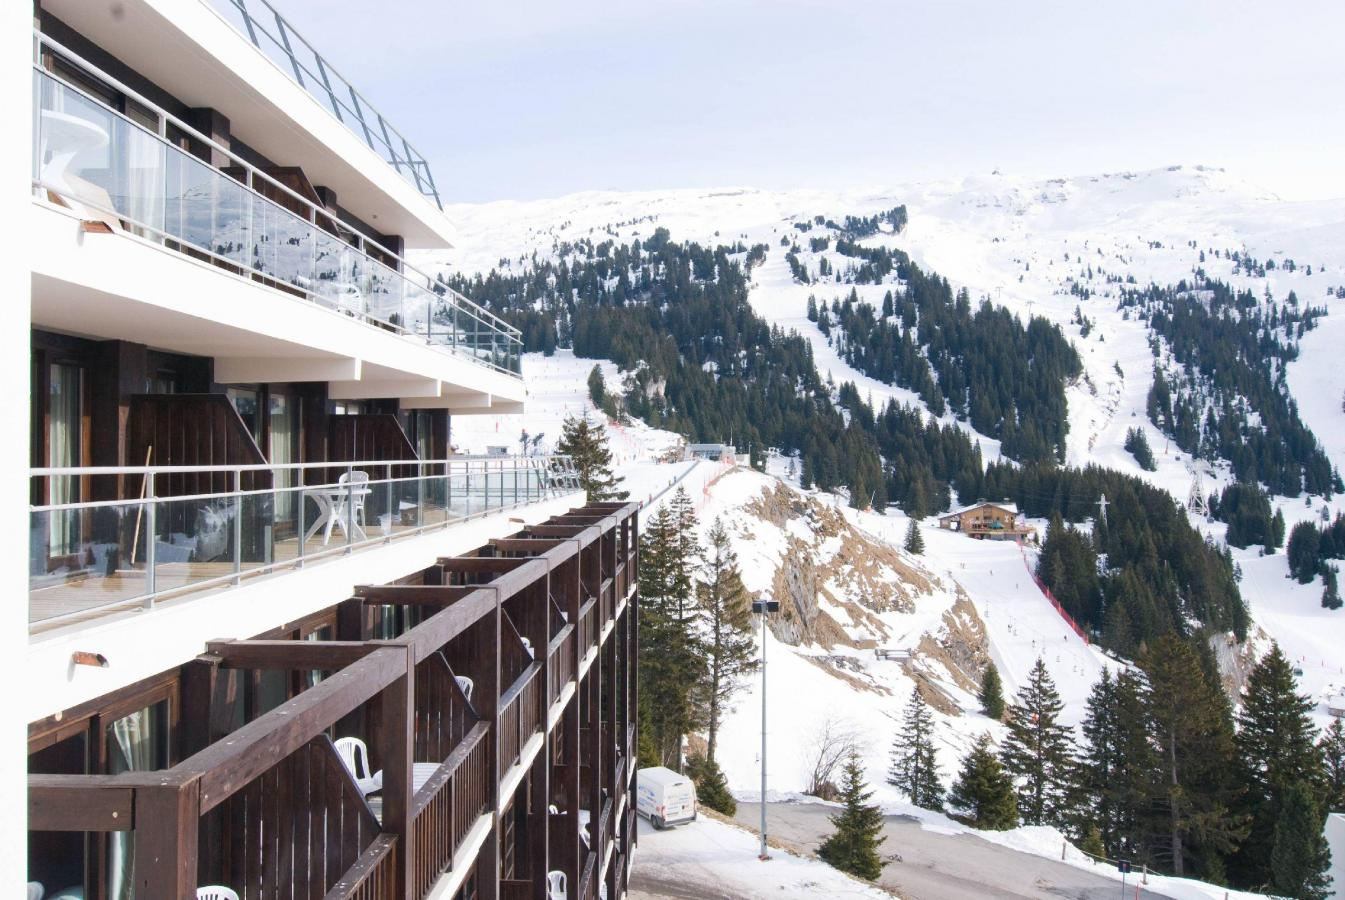 Station De Ski Flaine - Alpes Du Nord